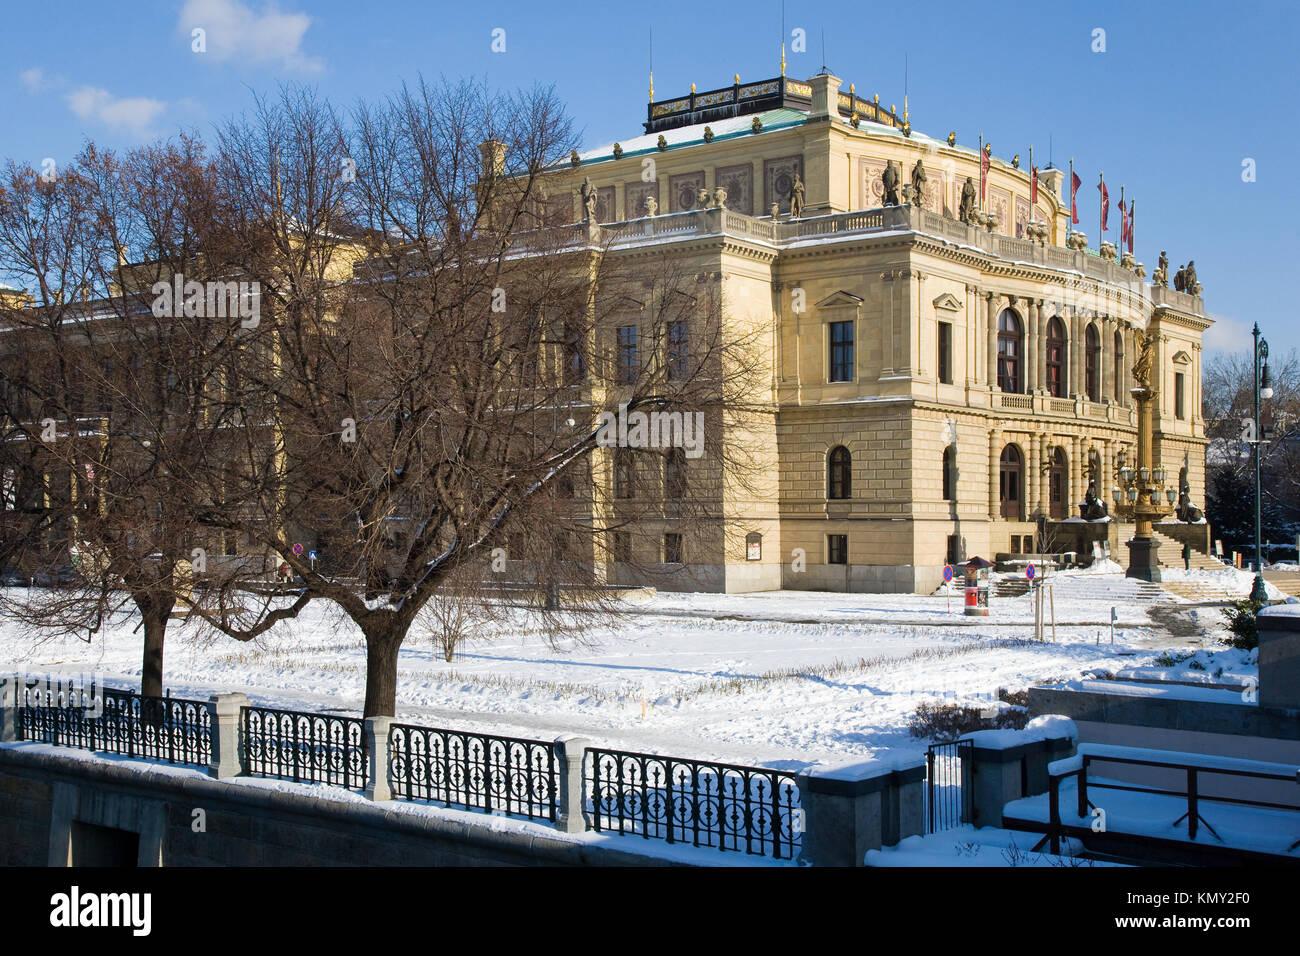 Rudolfinum, Alsovo nabrezi, Stare Mesto (UNESCO), Praha, Ceska republika / Rudolfinum, città vecchia, Praga, Repubblica Ceca Foto Stock